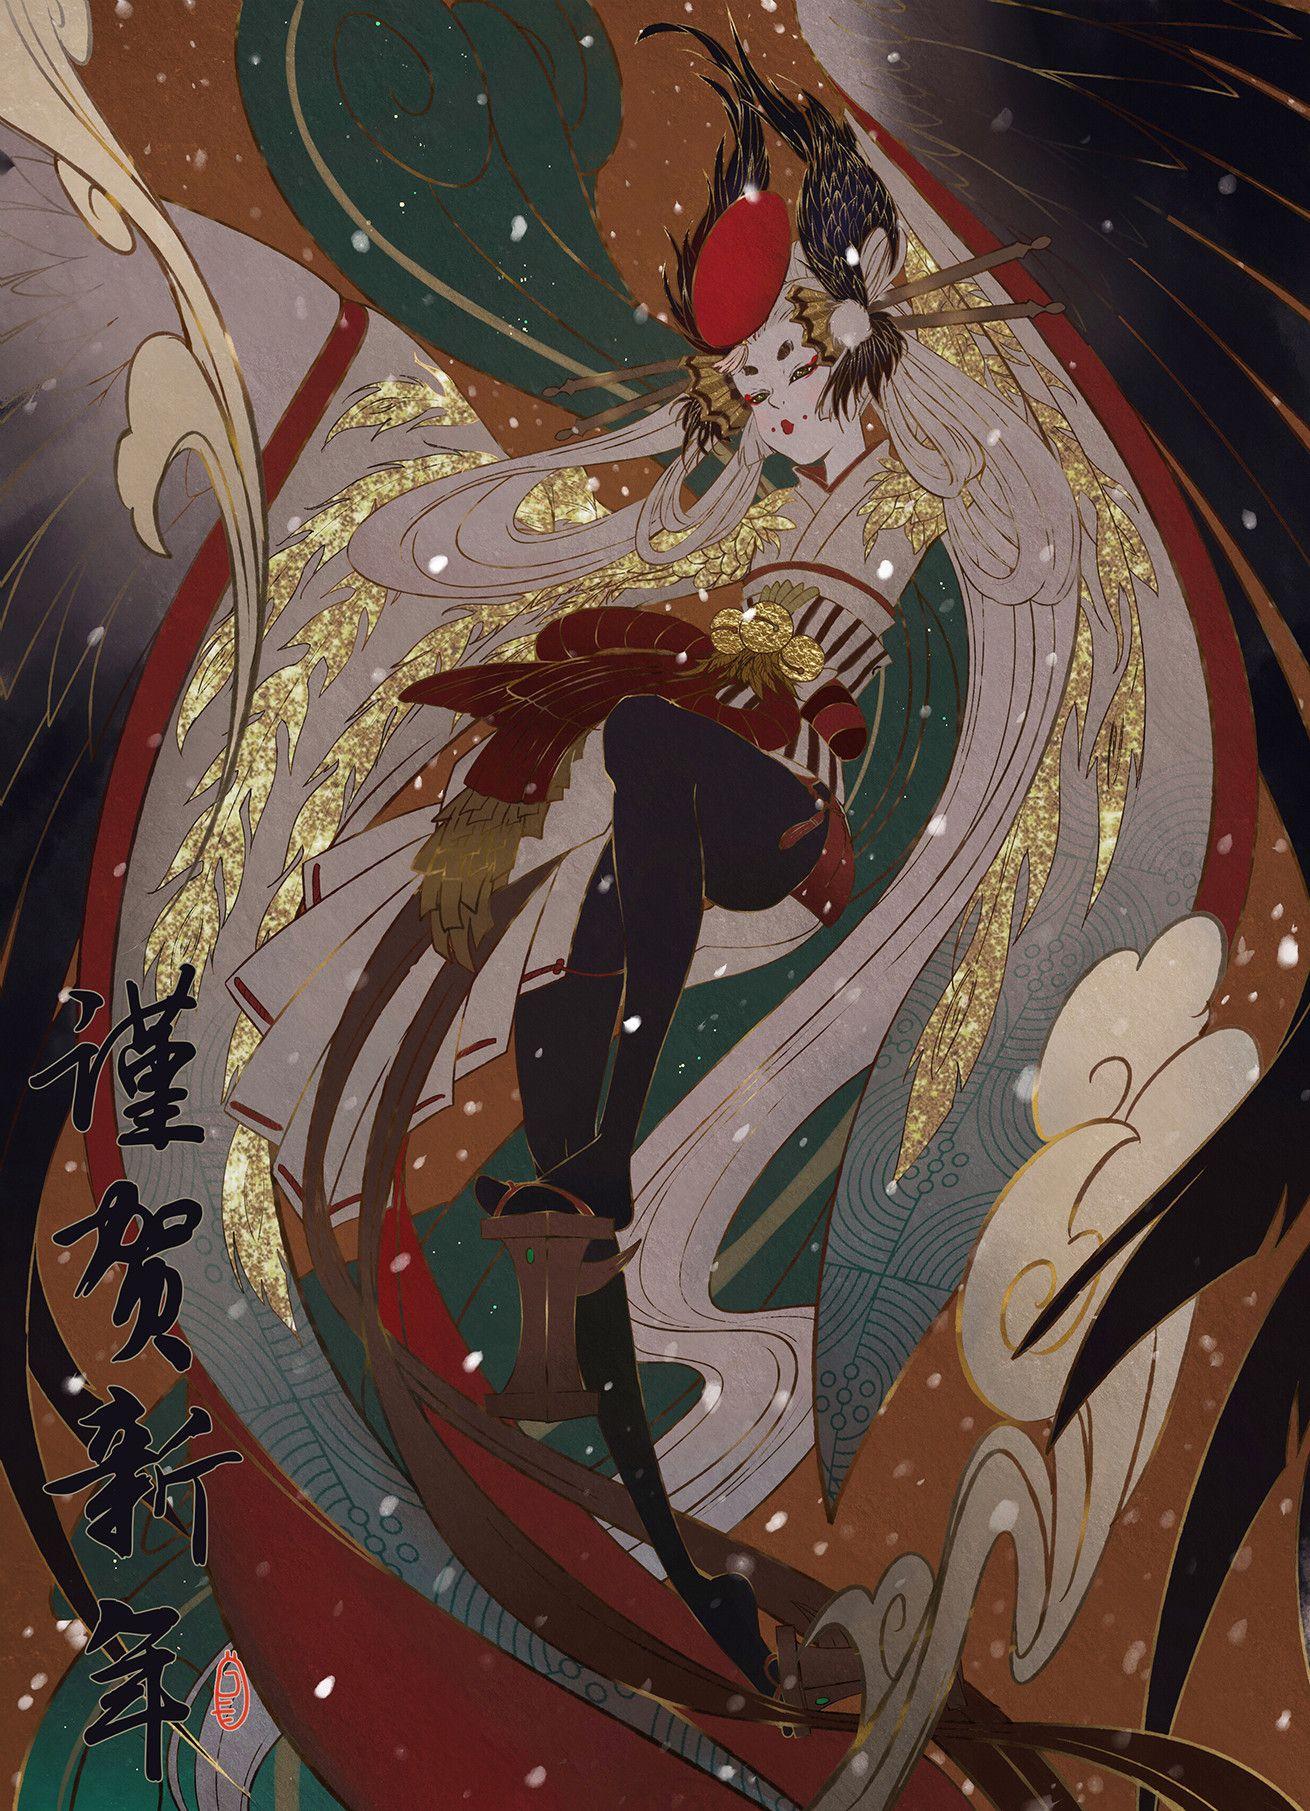 ArtStation 姑获鸟, Maho Chio (With images) Anime, Anime